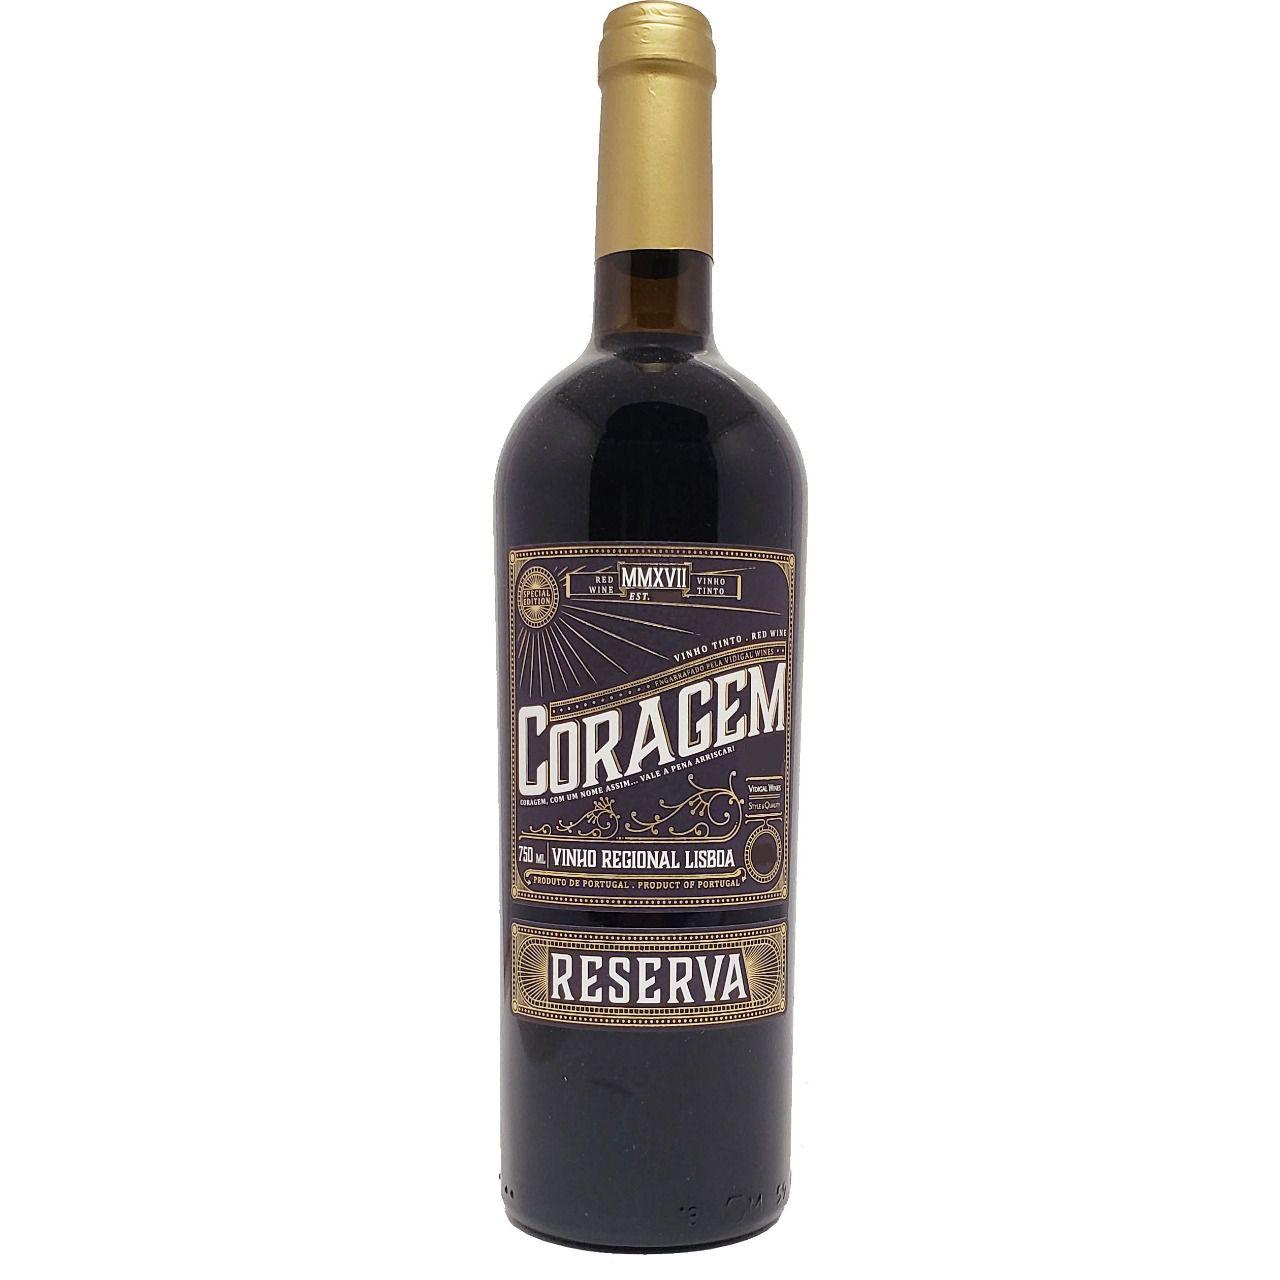 Vinho Tinto Coragem Reserva - 750ml -